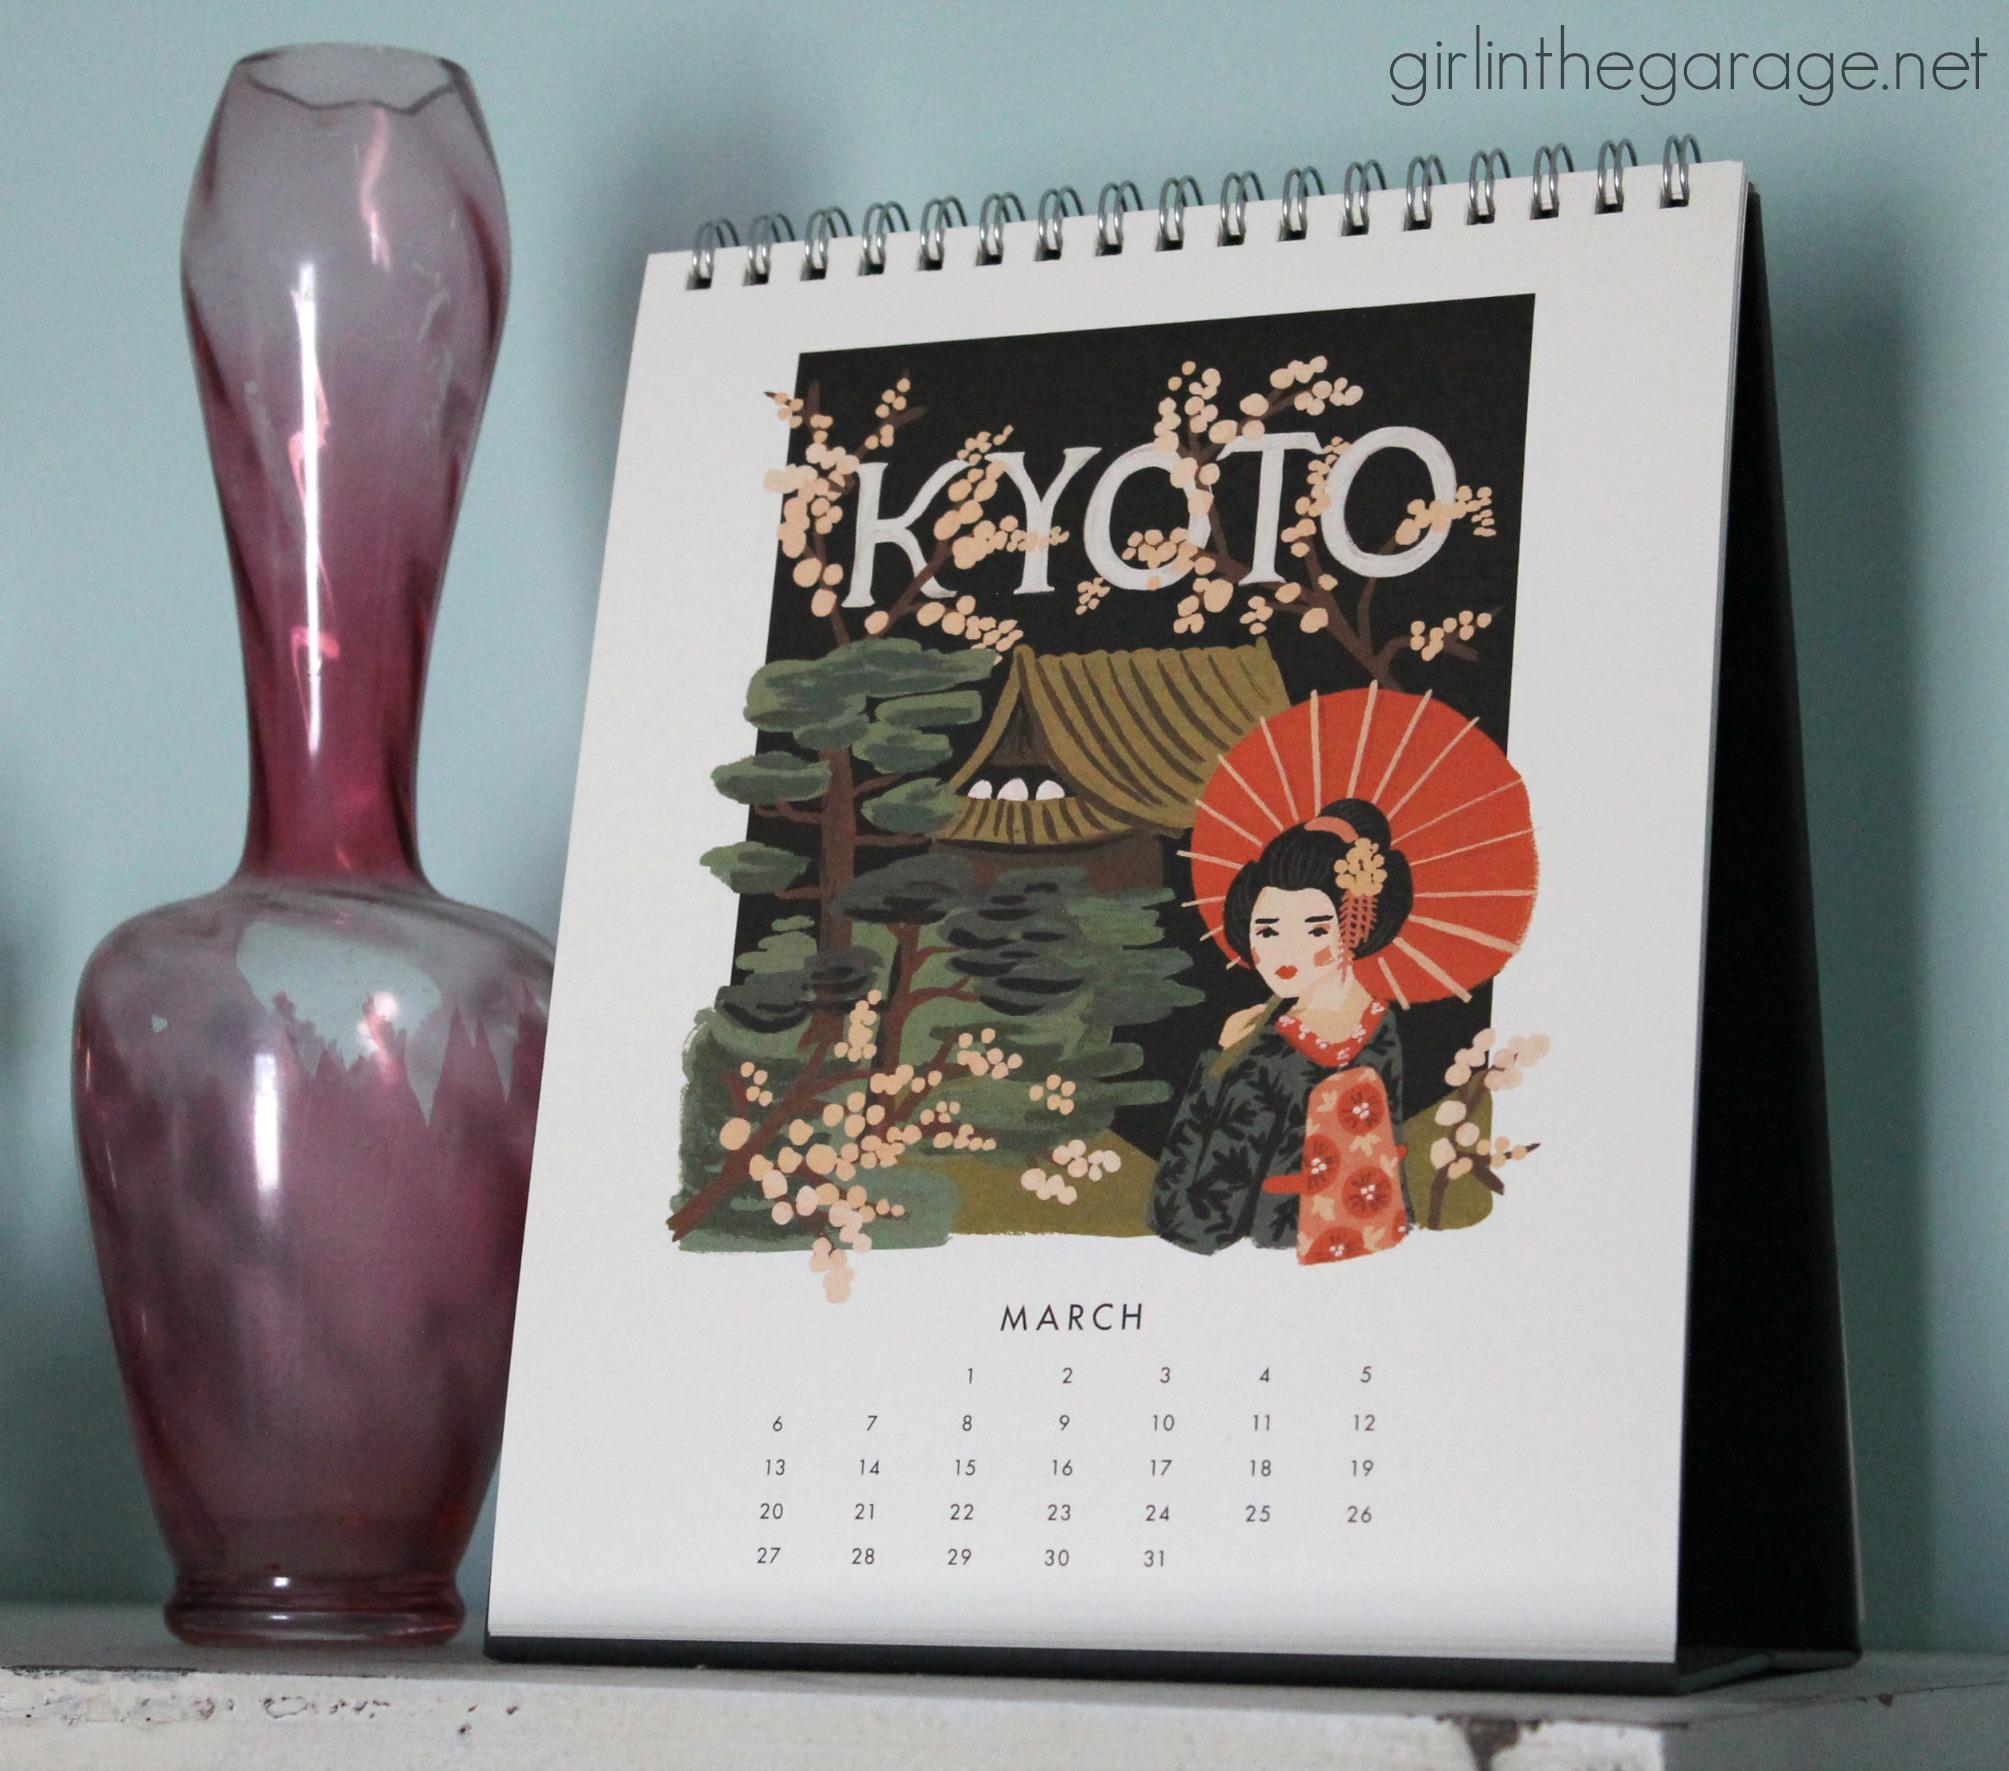 Rifle Paper Co. Calendar - Girl in the Garage